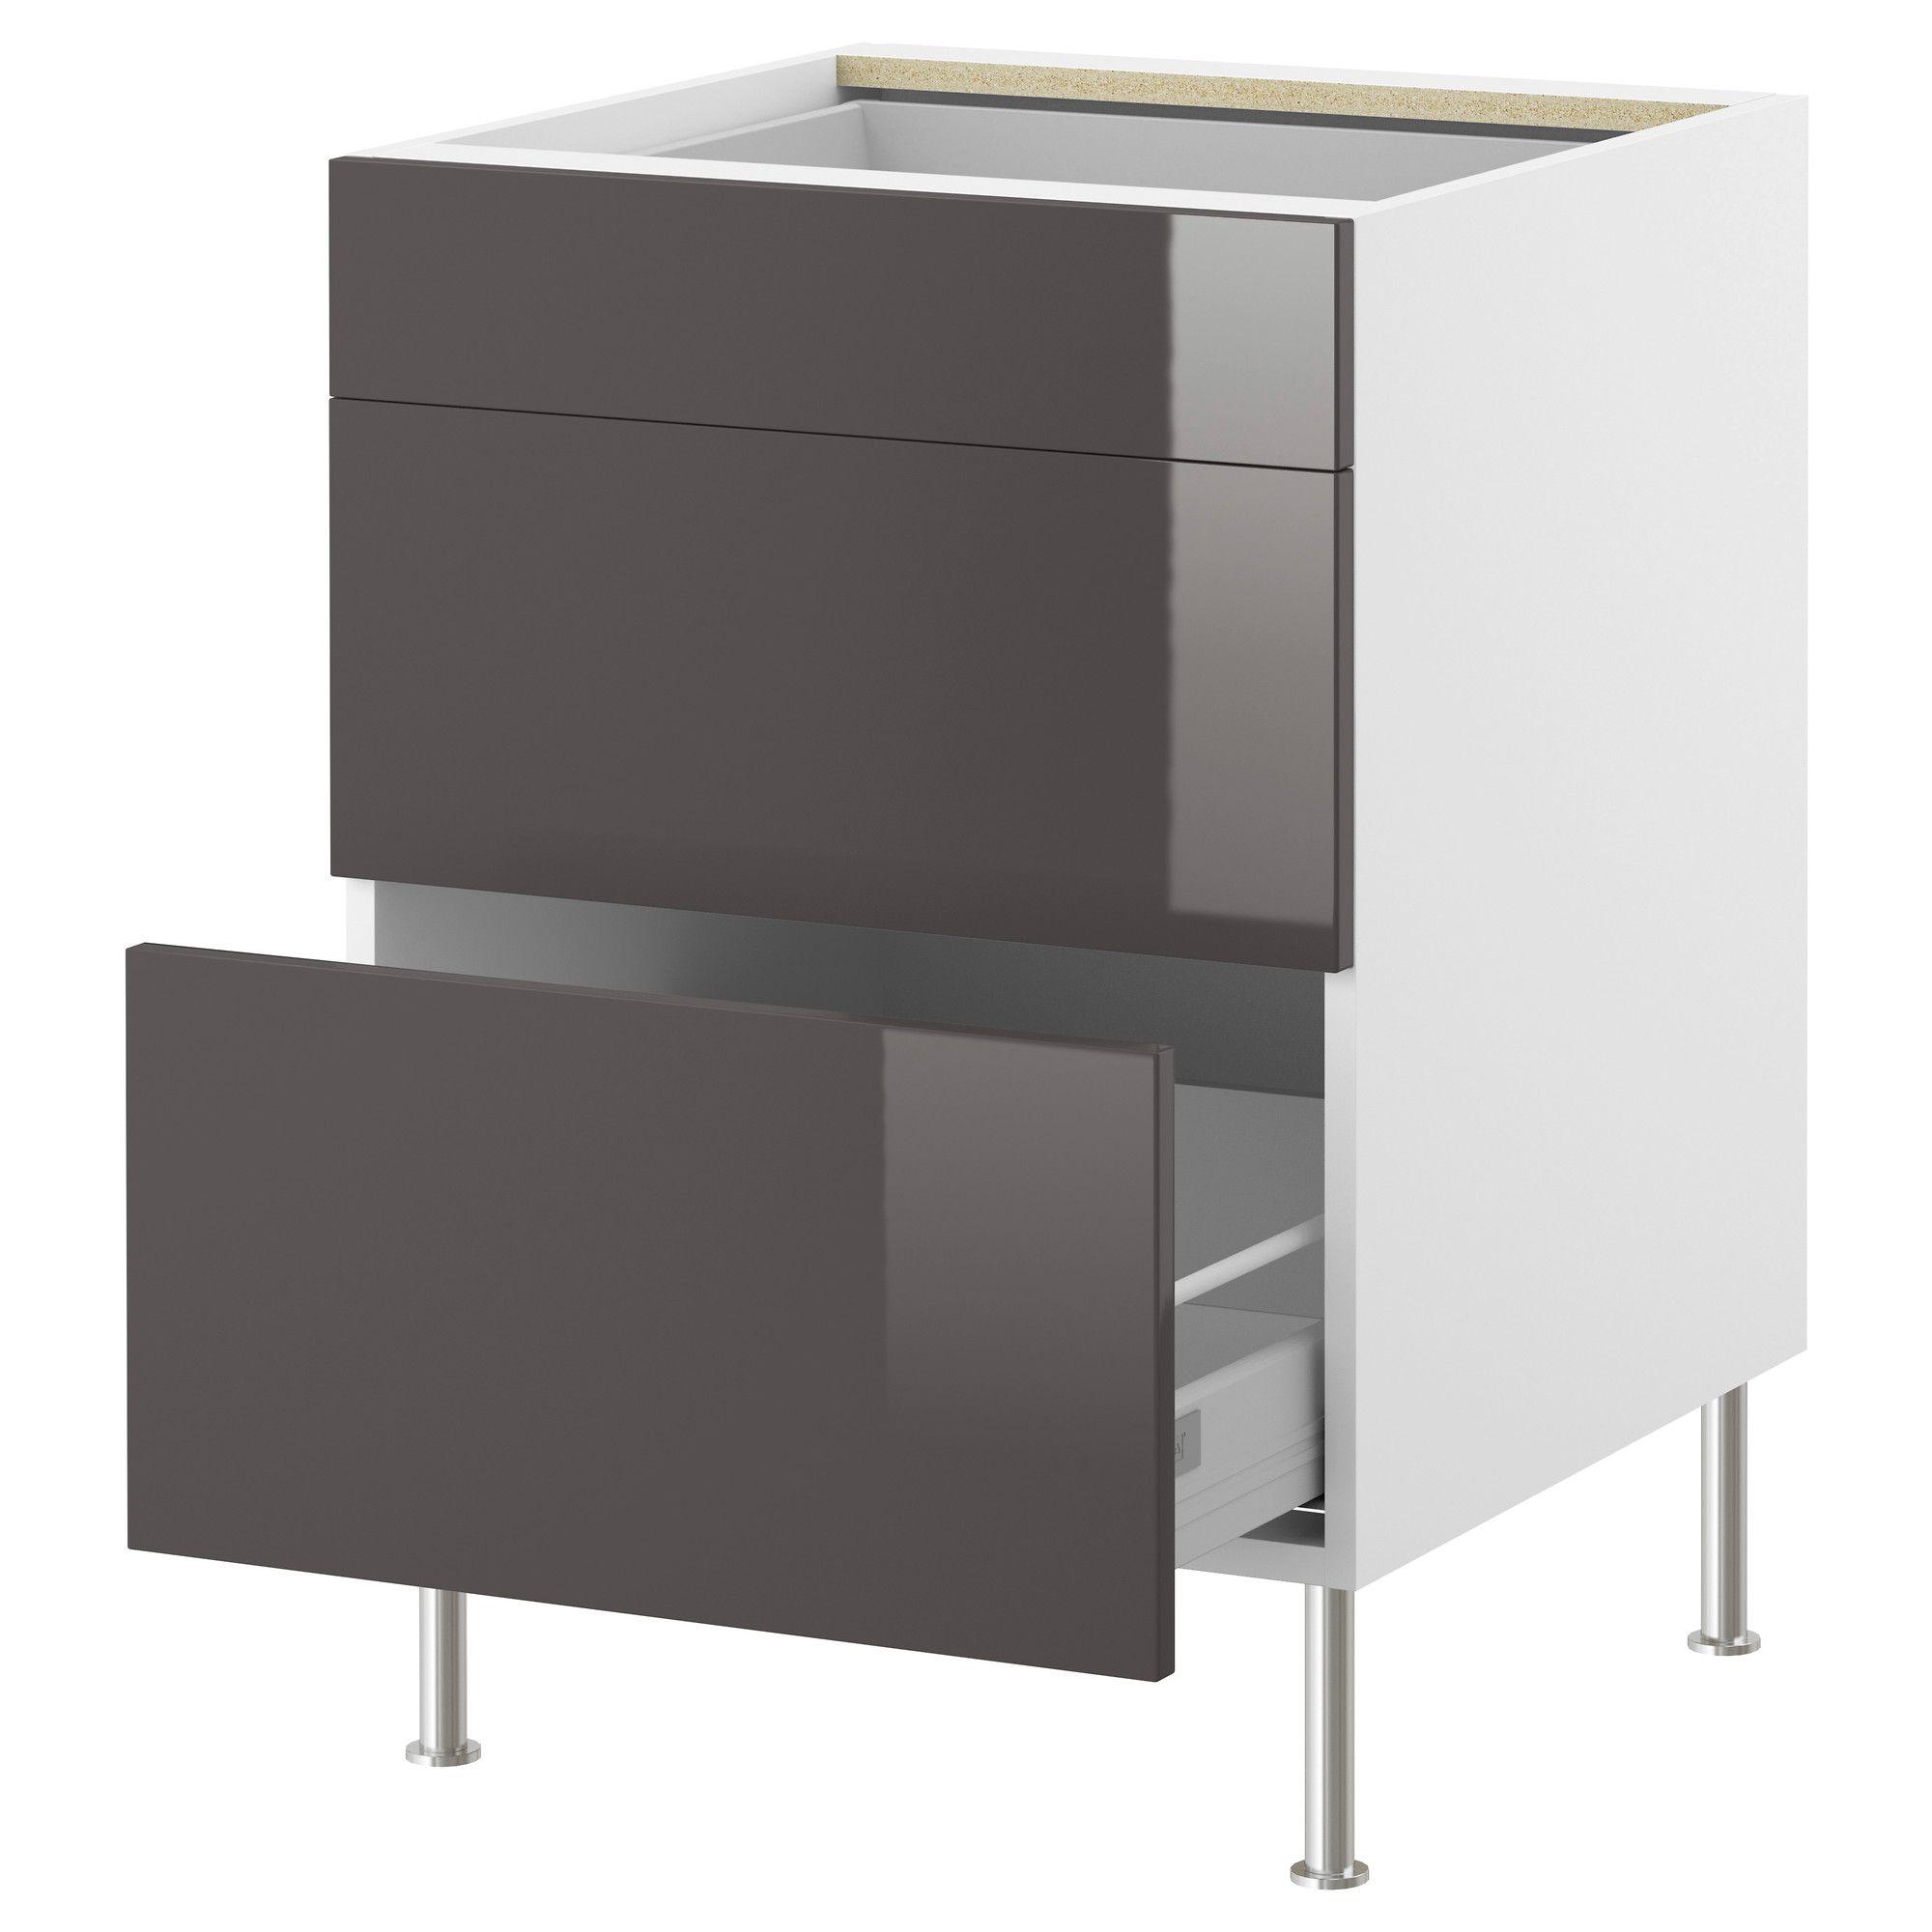 US Furniture and Home Furnishings Ikea, Ikea built in